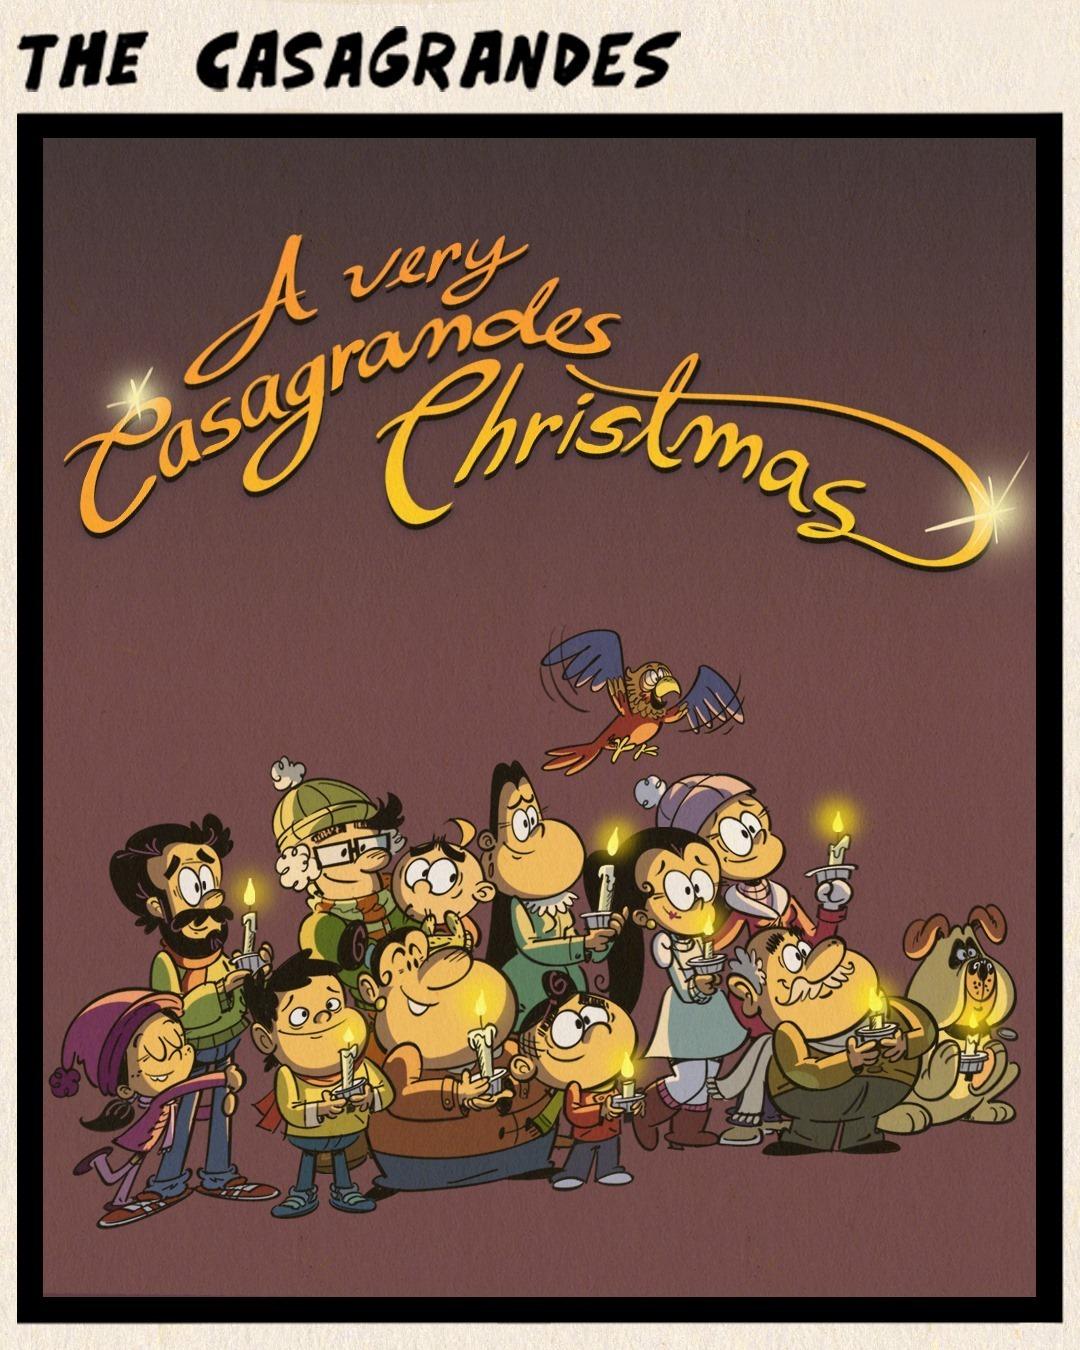 A Very Casagrandes Christmas